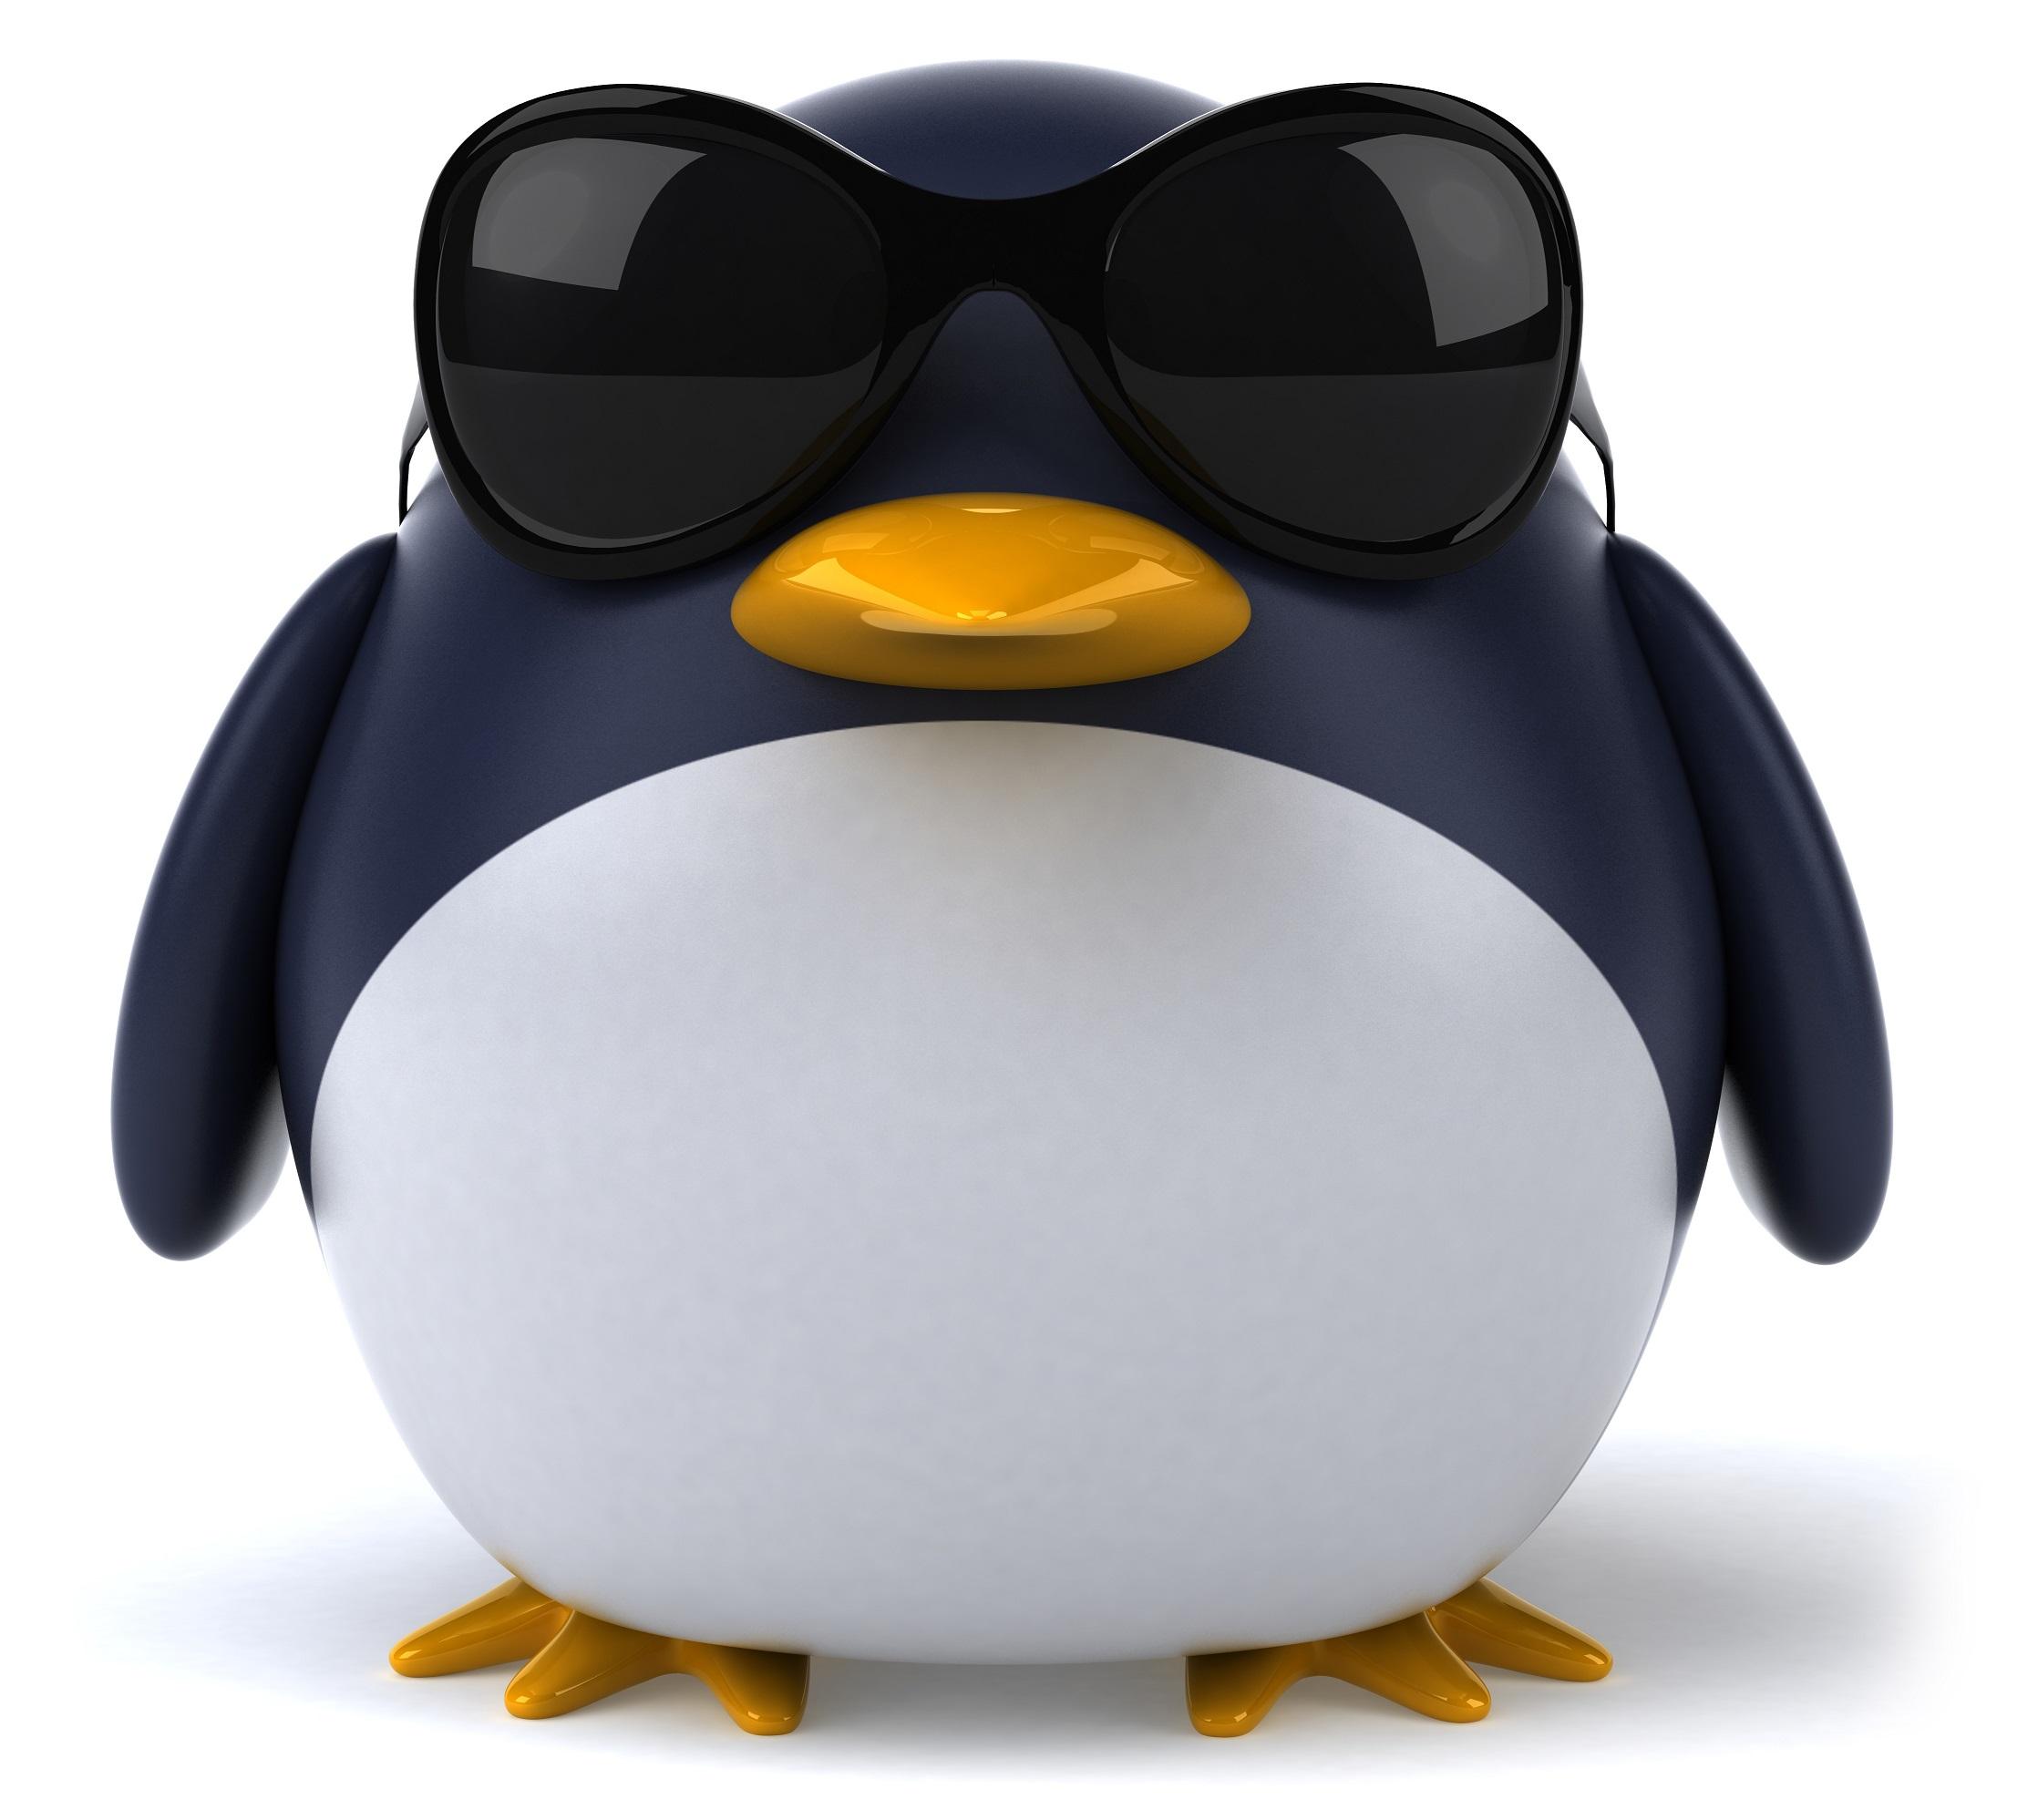 Google pingouin 3.0 est arrivé !